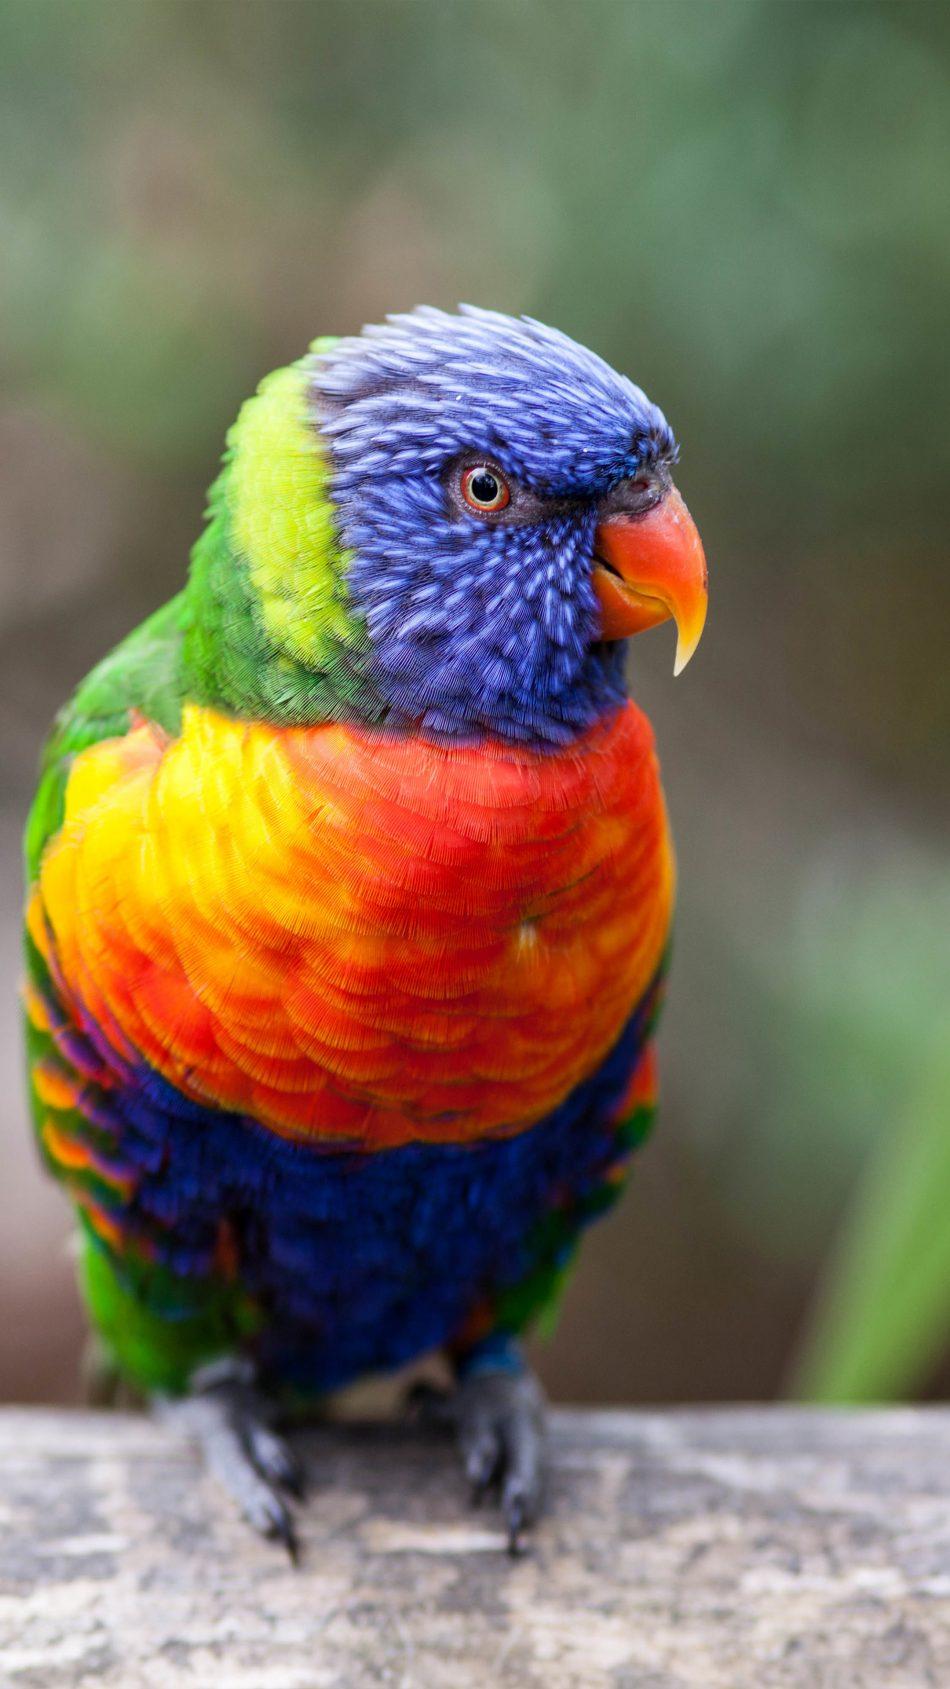 Rainbow Lorikeet Parrot 4K Ultra HD Mobile Wallpaper